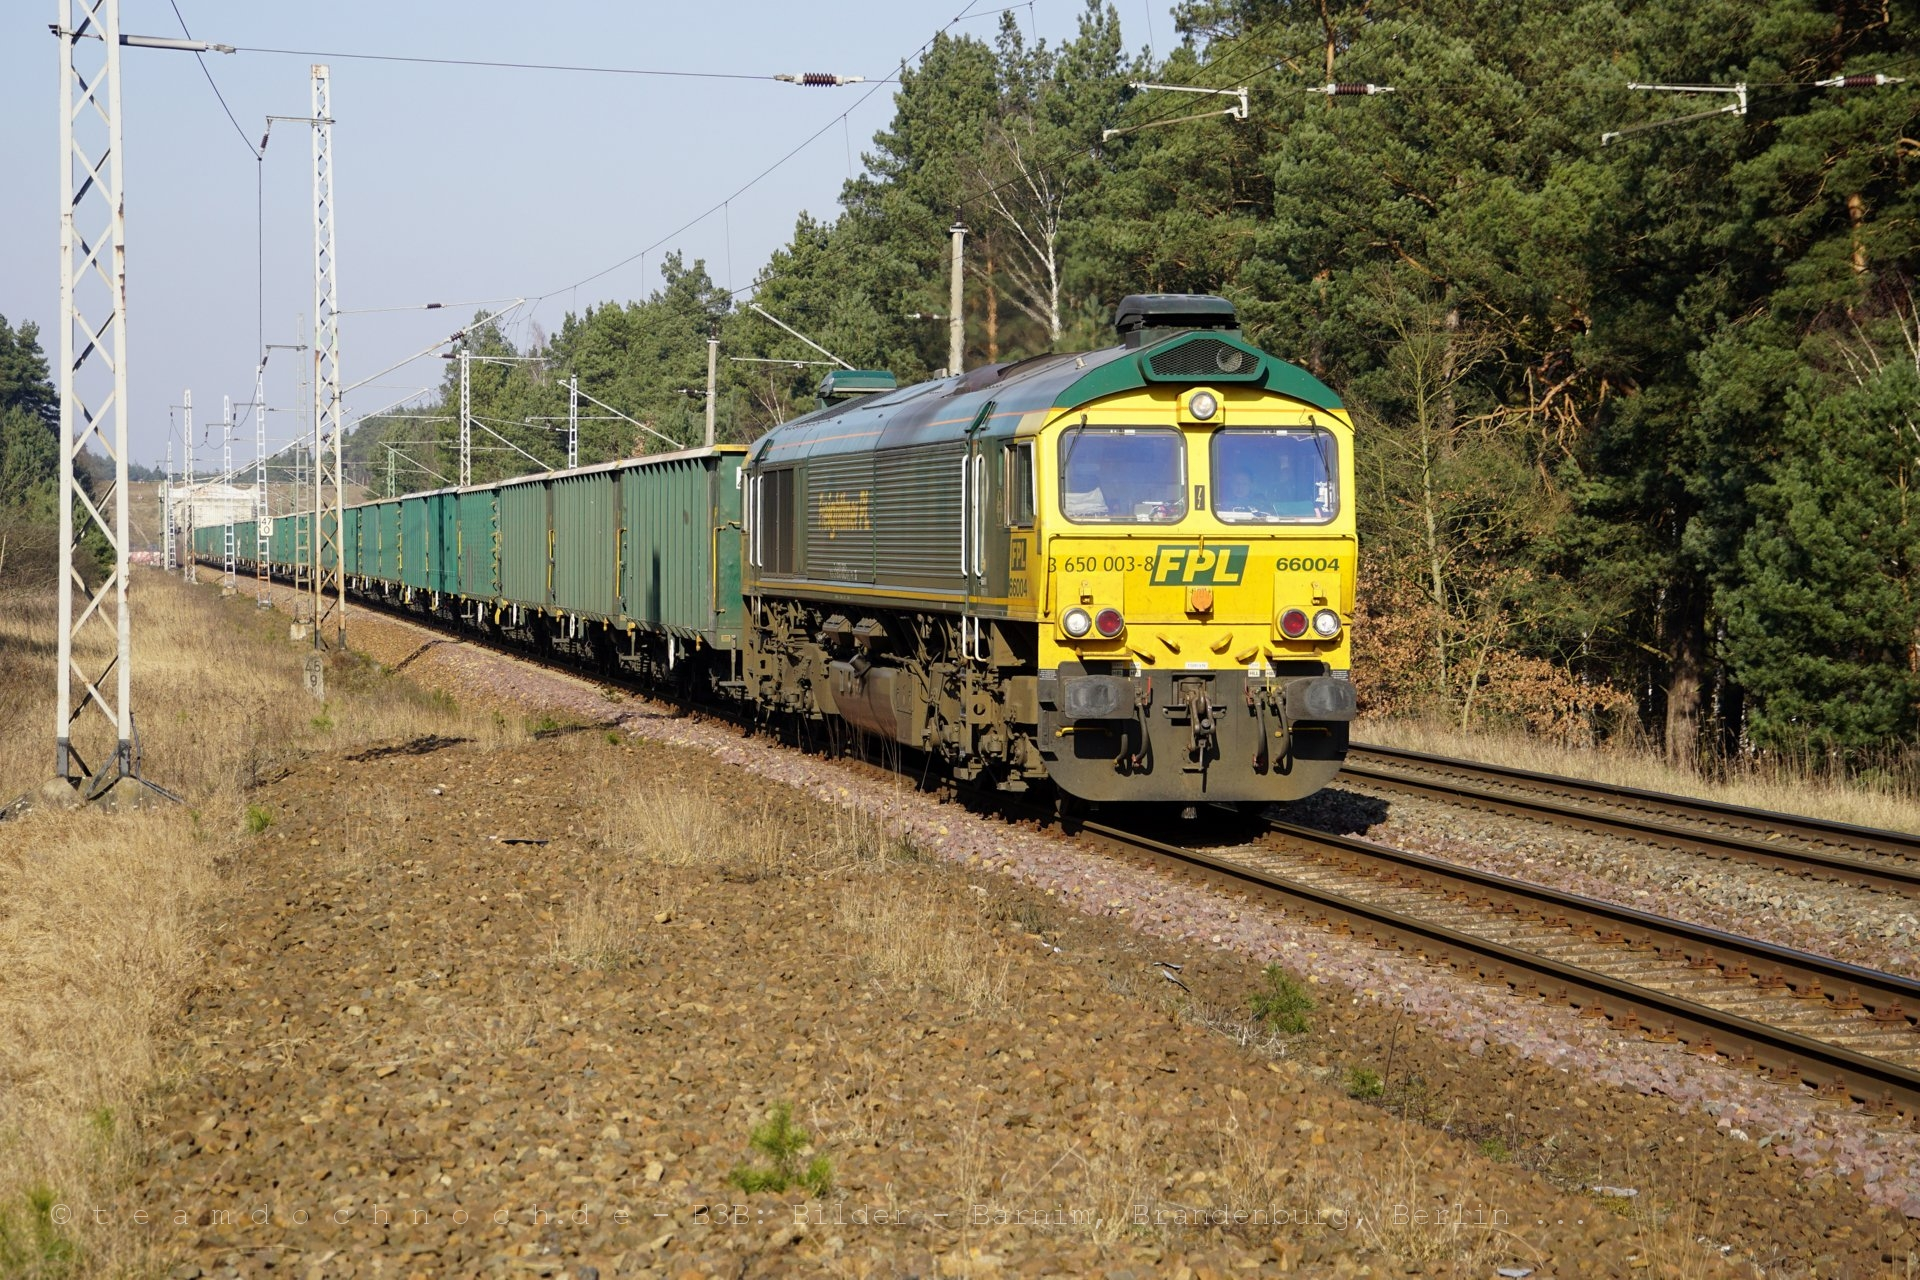 Freightliner 66004